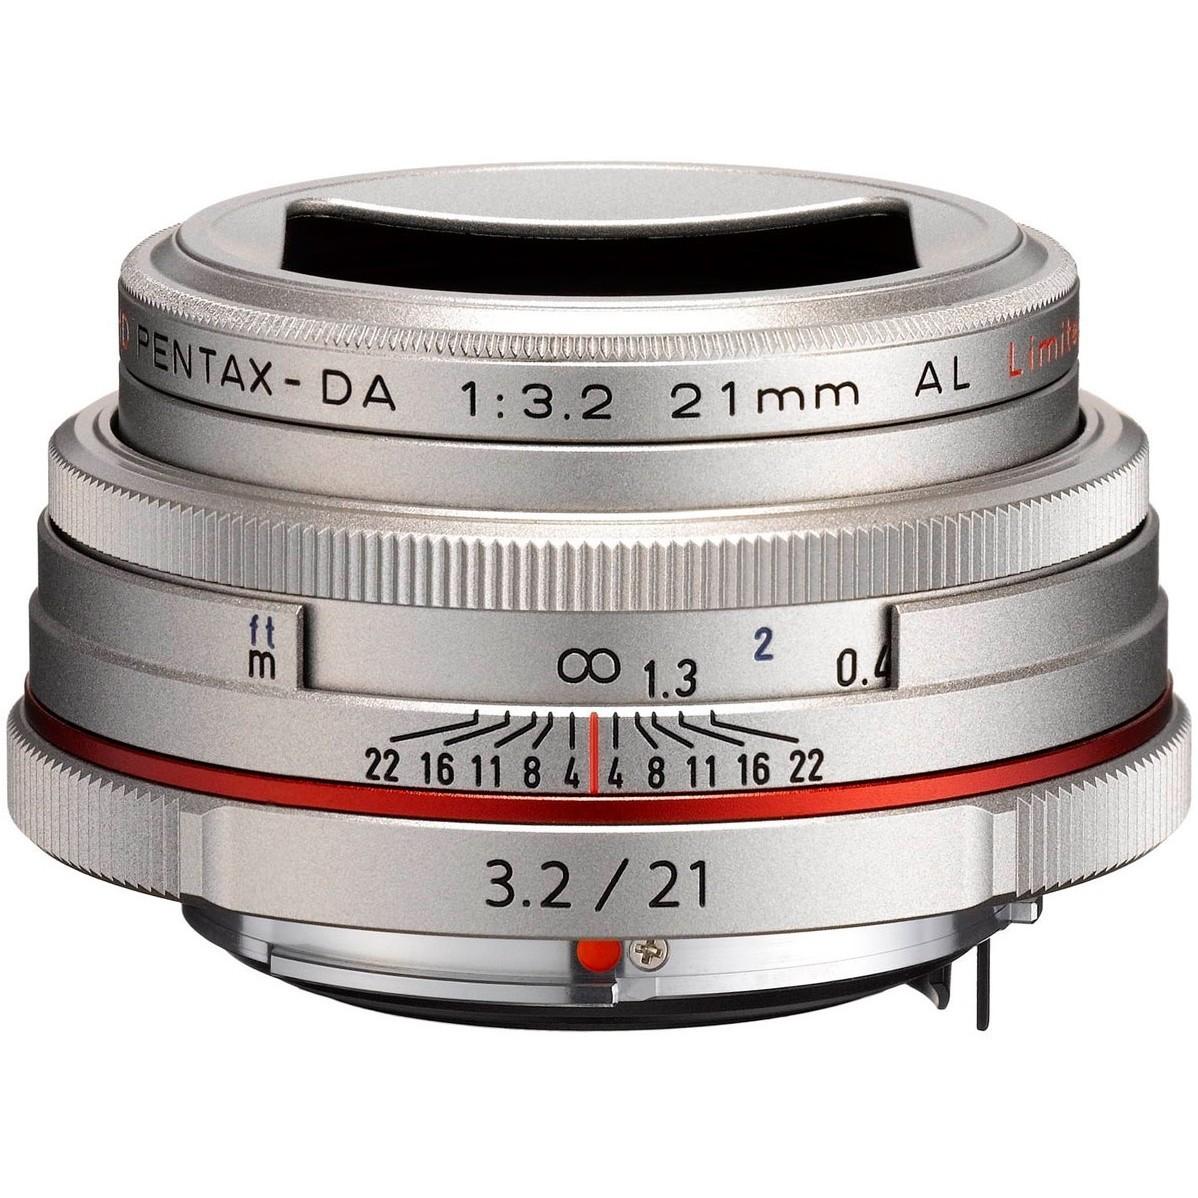 Объектив Pentax HD DA 21mm f/3.2 AL Limited